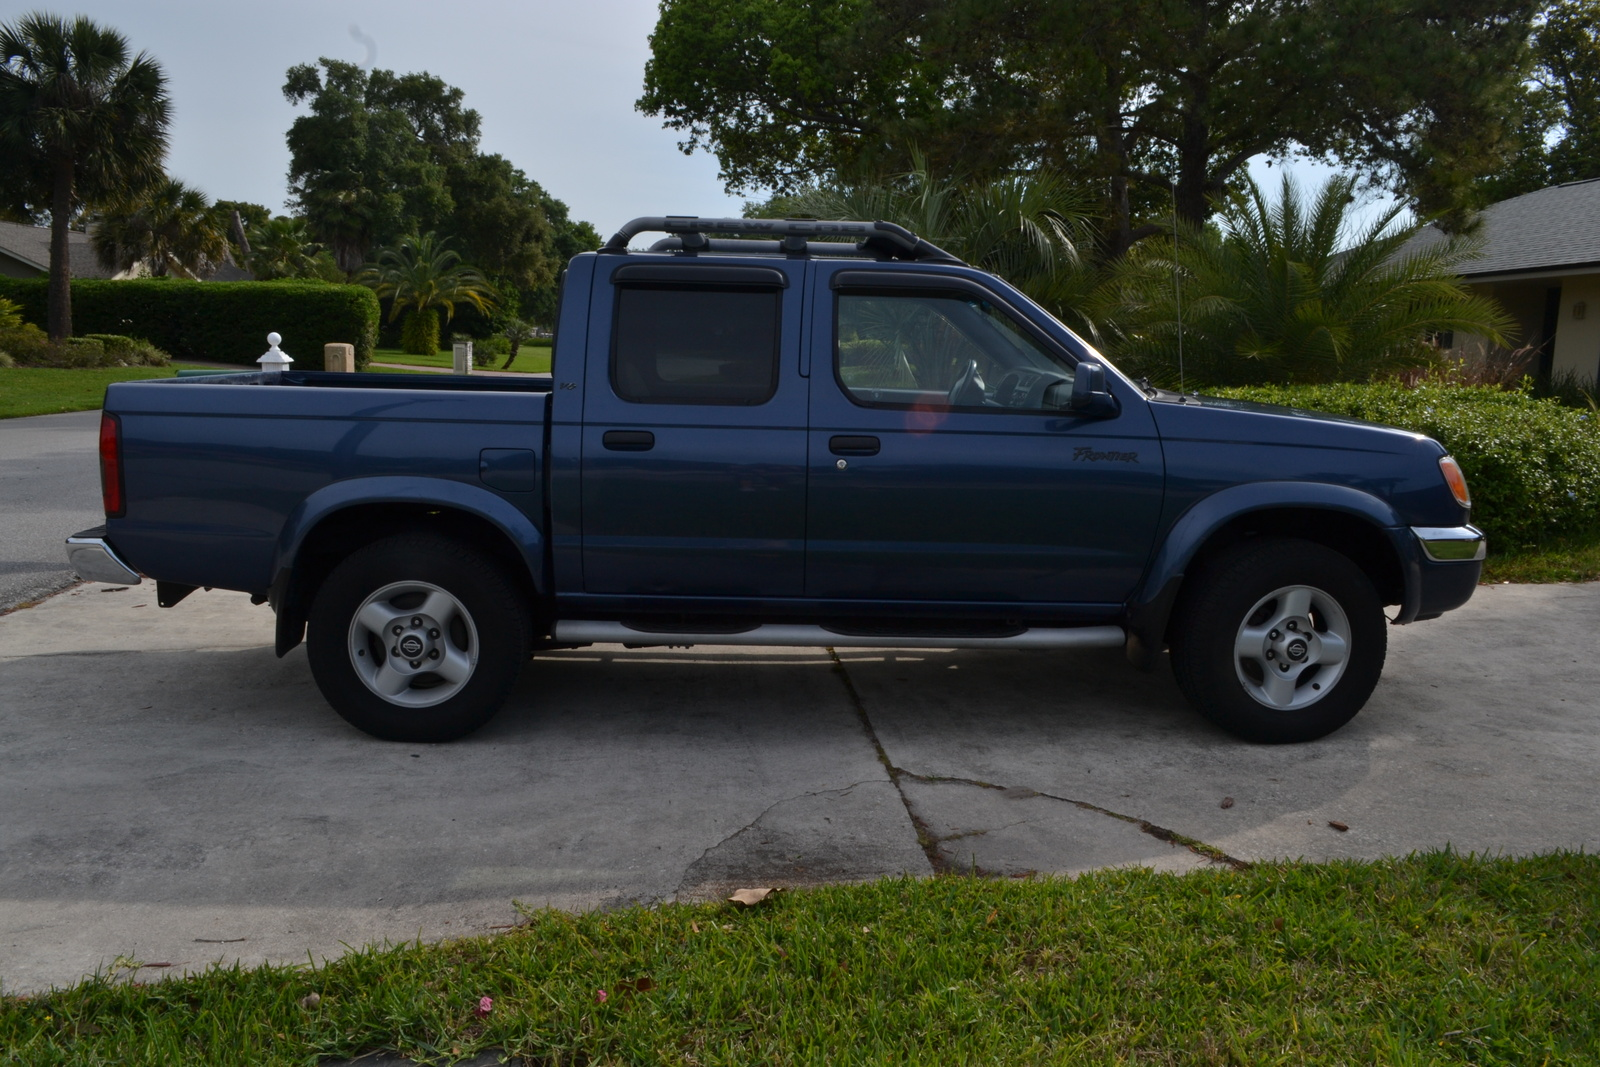 2000 Nissan Frontier Se Crew Cab Reviews >> 2000 Nissan Frontier - Overview - CarGurus